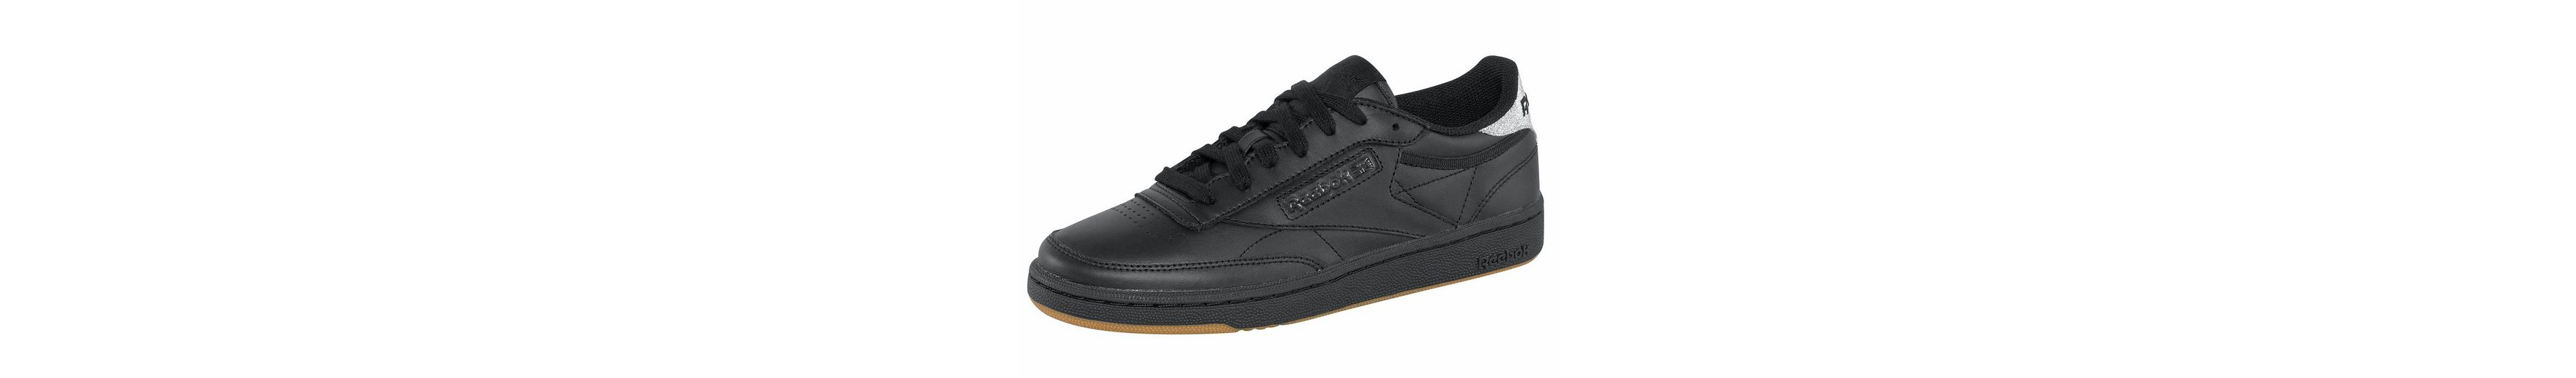 Sneakernews Verkauf Online Reebok Classic Club C 85 Diamond Sneaker Spielfrei Versand NNmicOF